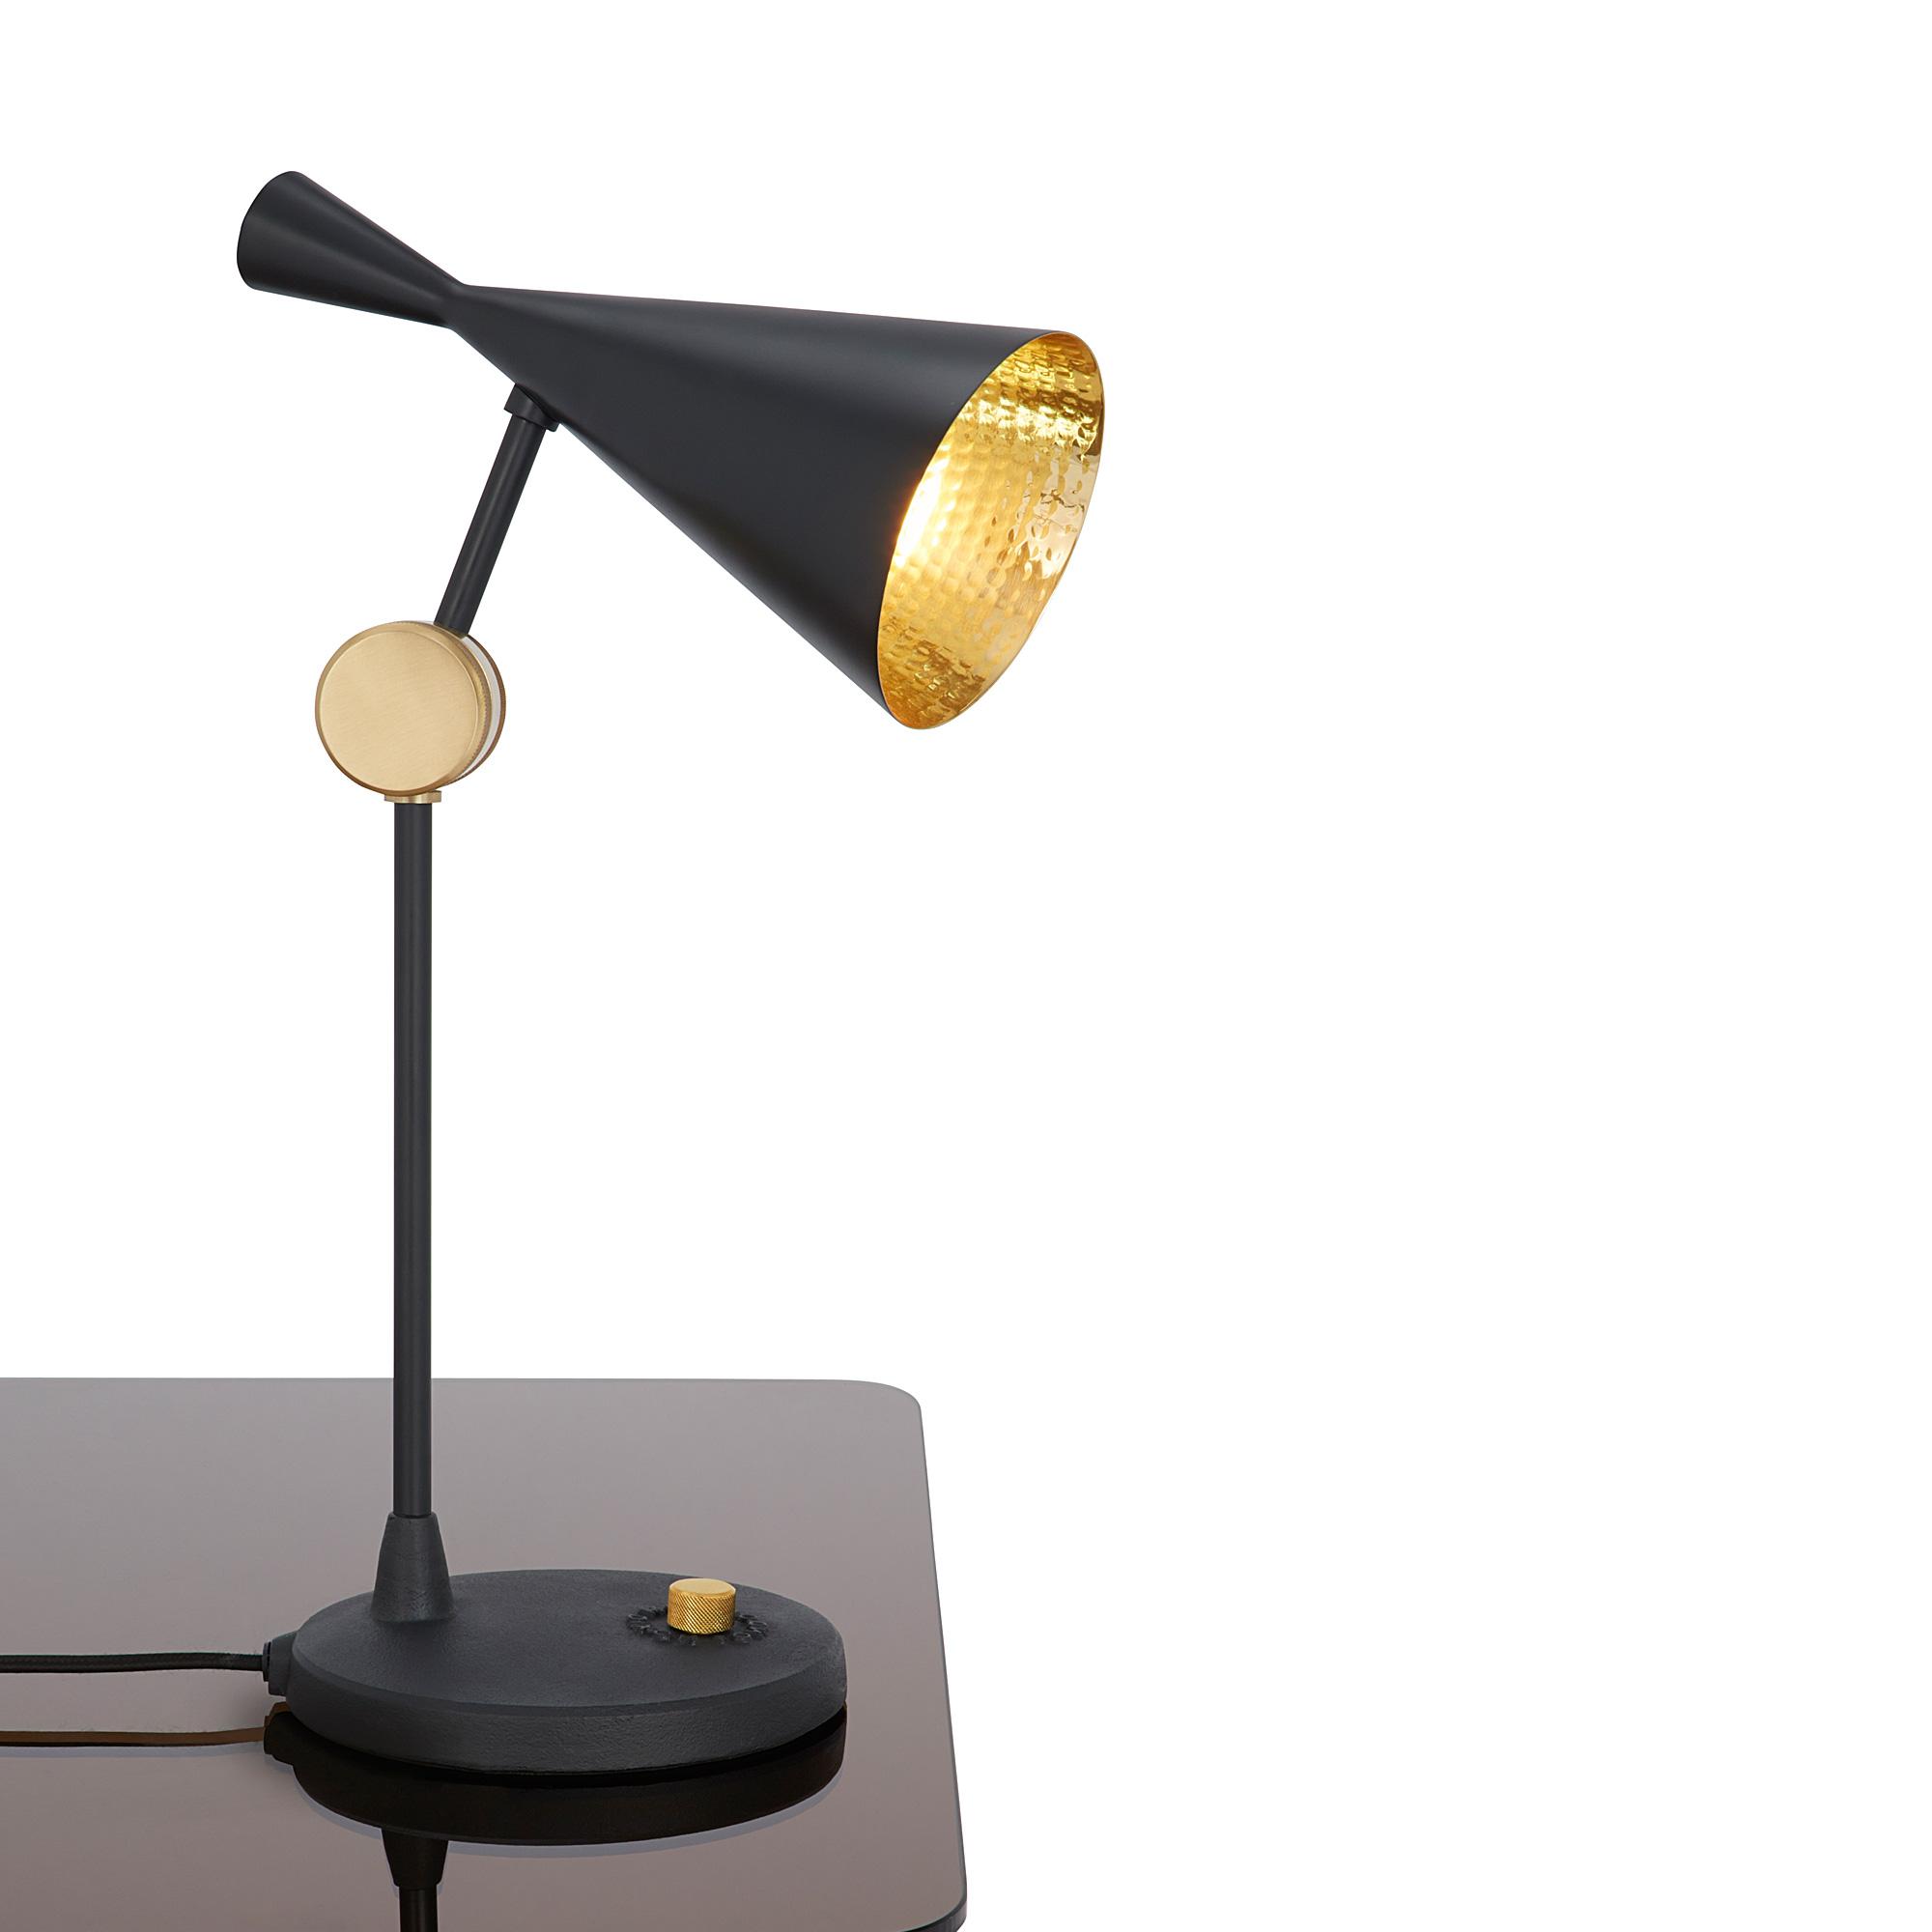 tom dixon beat table tischleuchte mit dimmer blt01eu. Black Bedroom Furniture Sets. Home Design Ideas